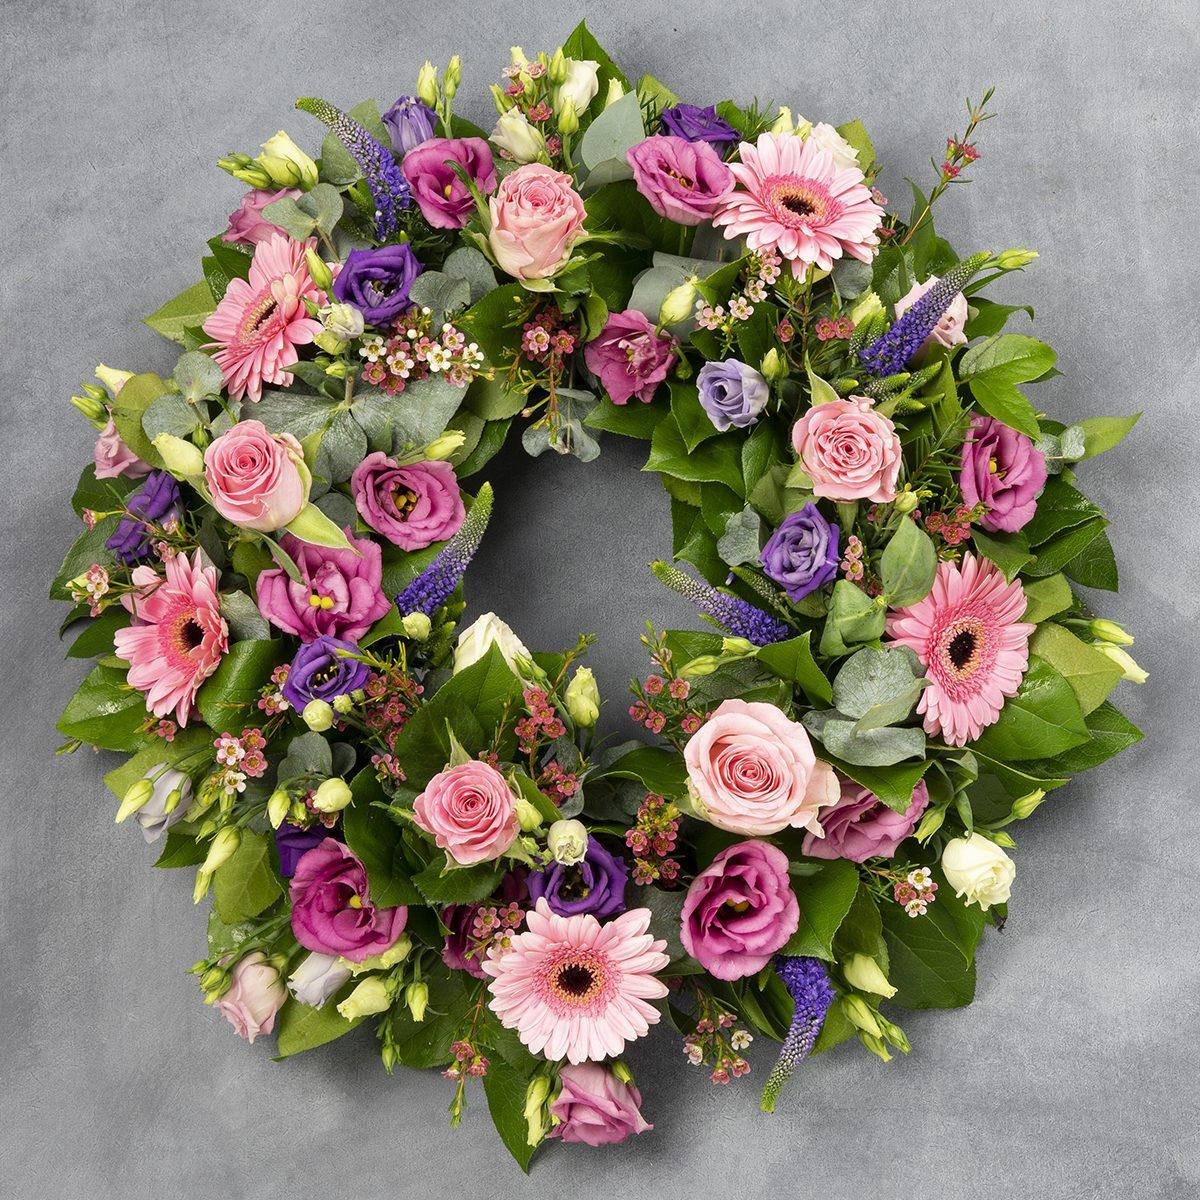 Delgany Sympathy Wreath